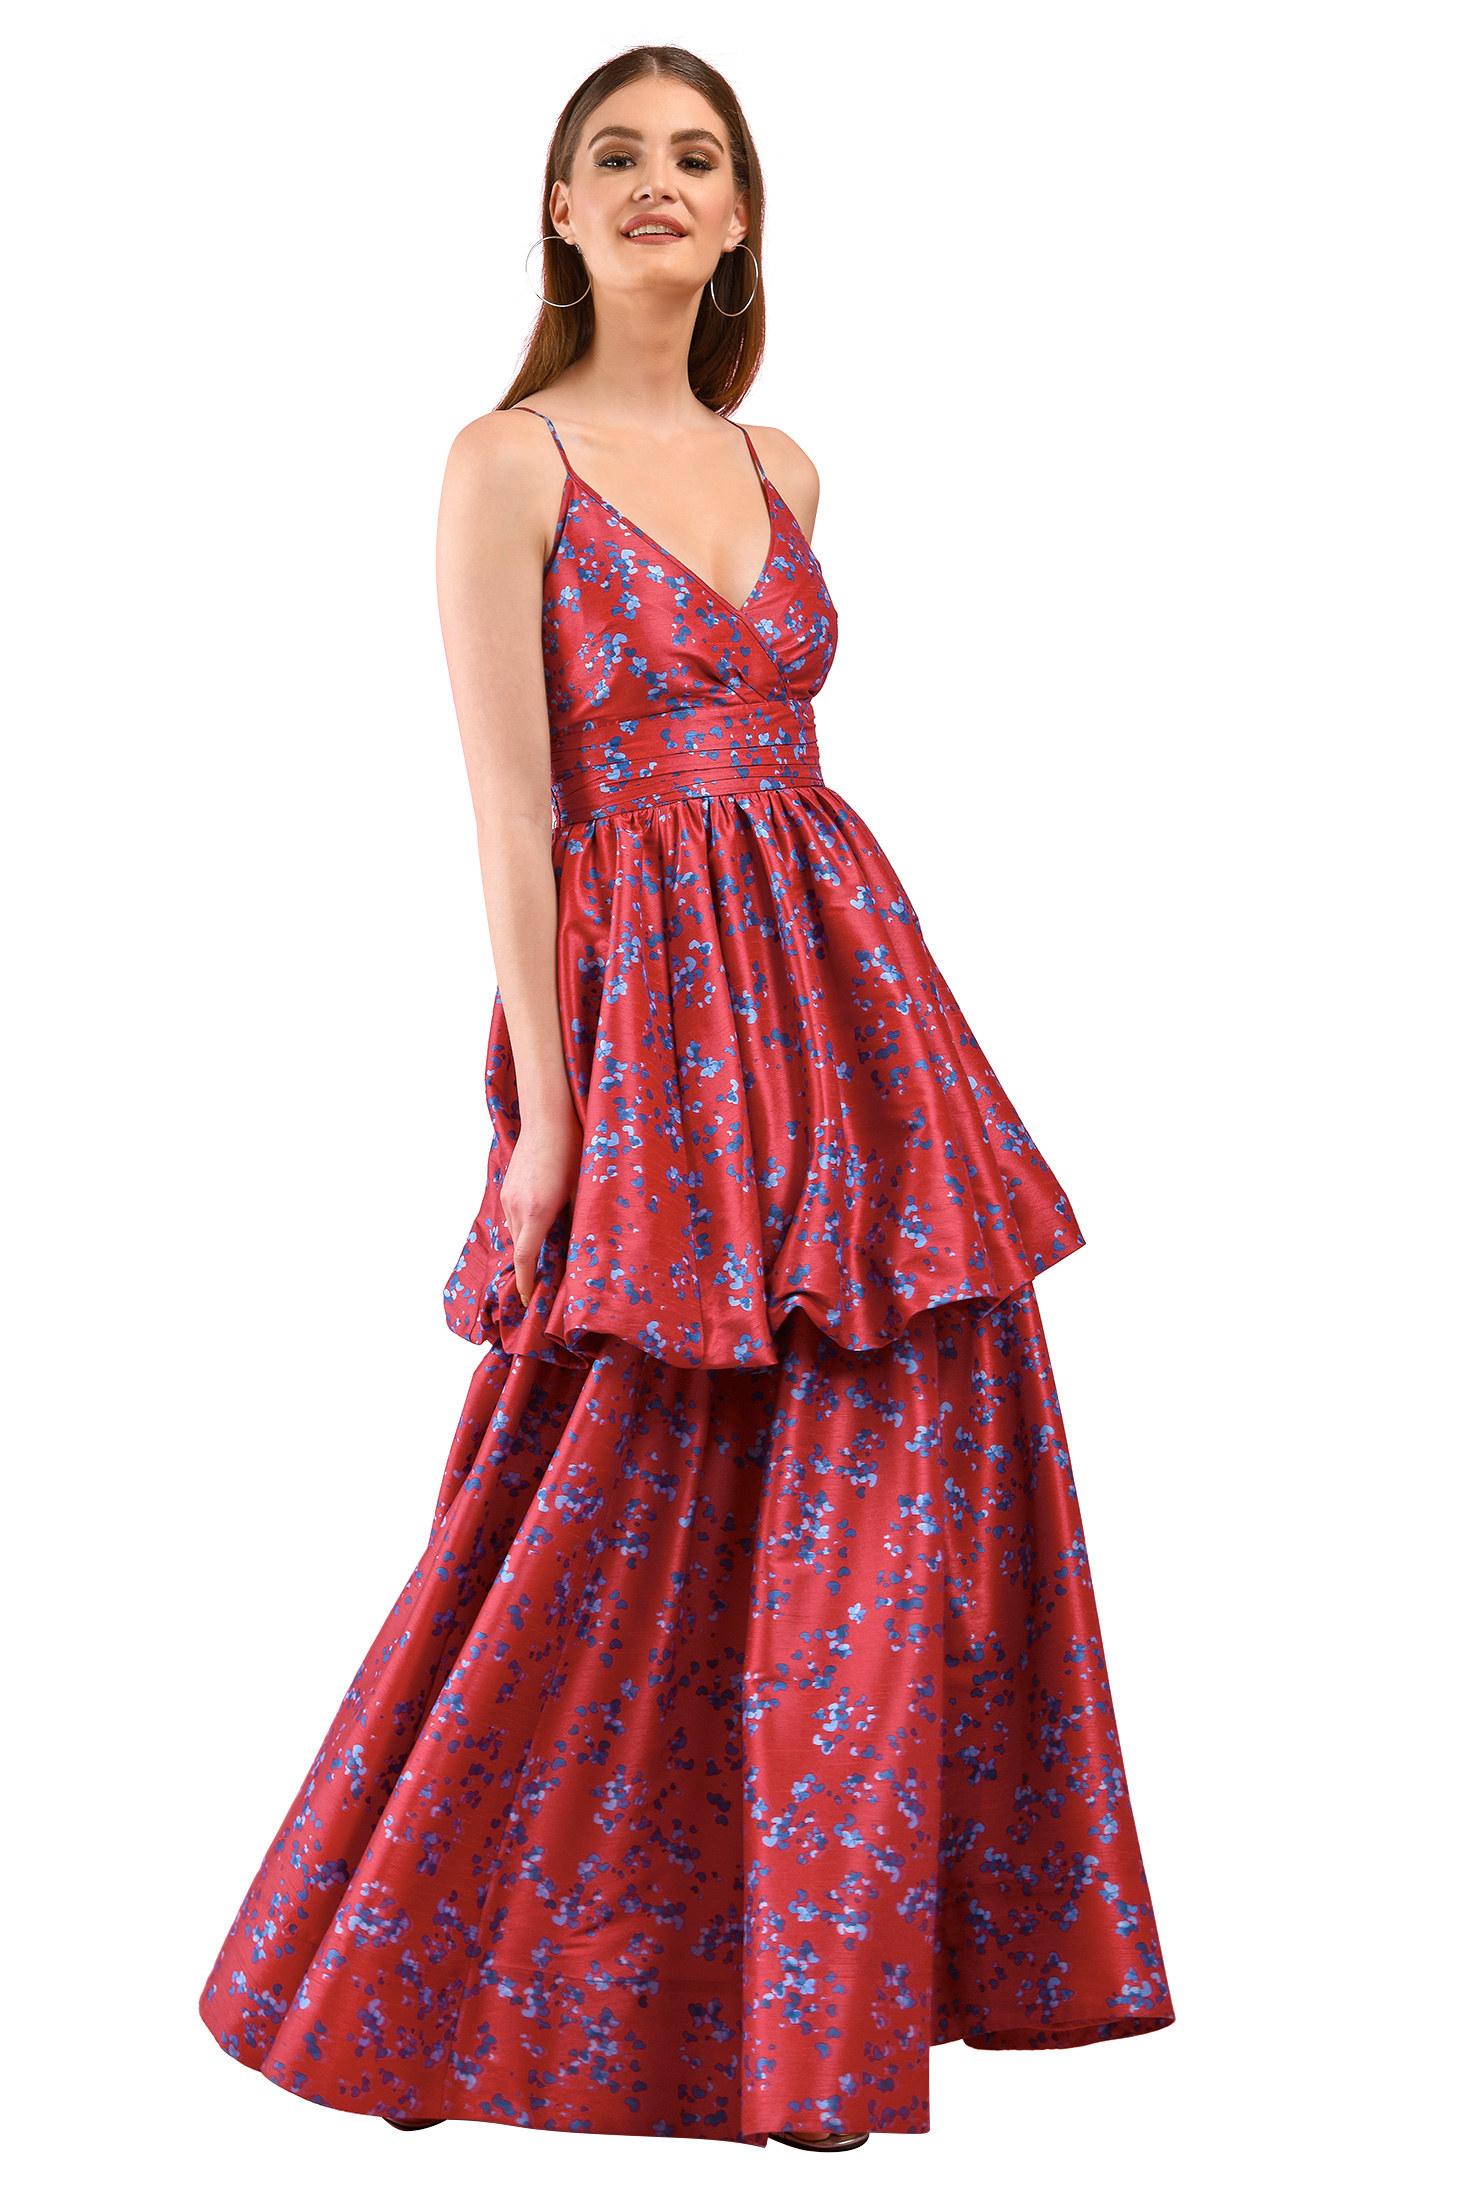 d529b78a6bcbdb The Best Places To Buy A Unique Prom Dress Online